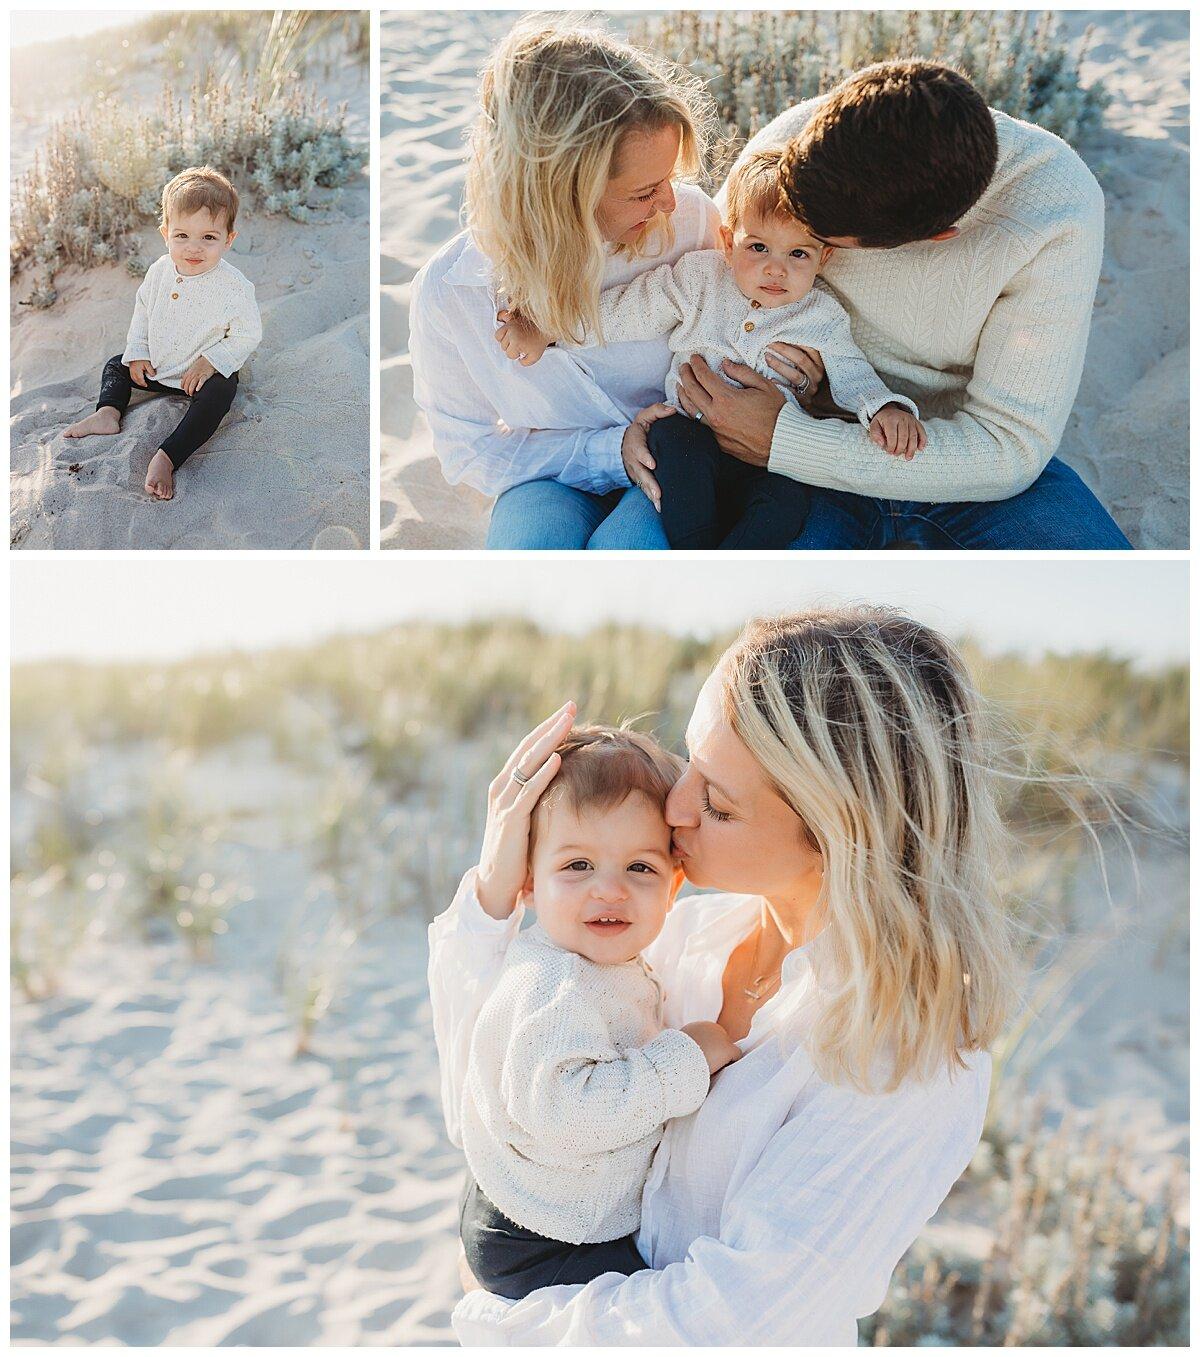 photographer for natural family photos